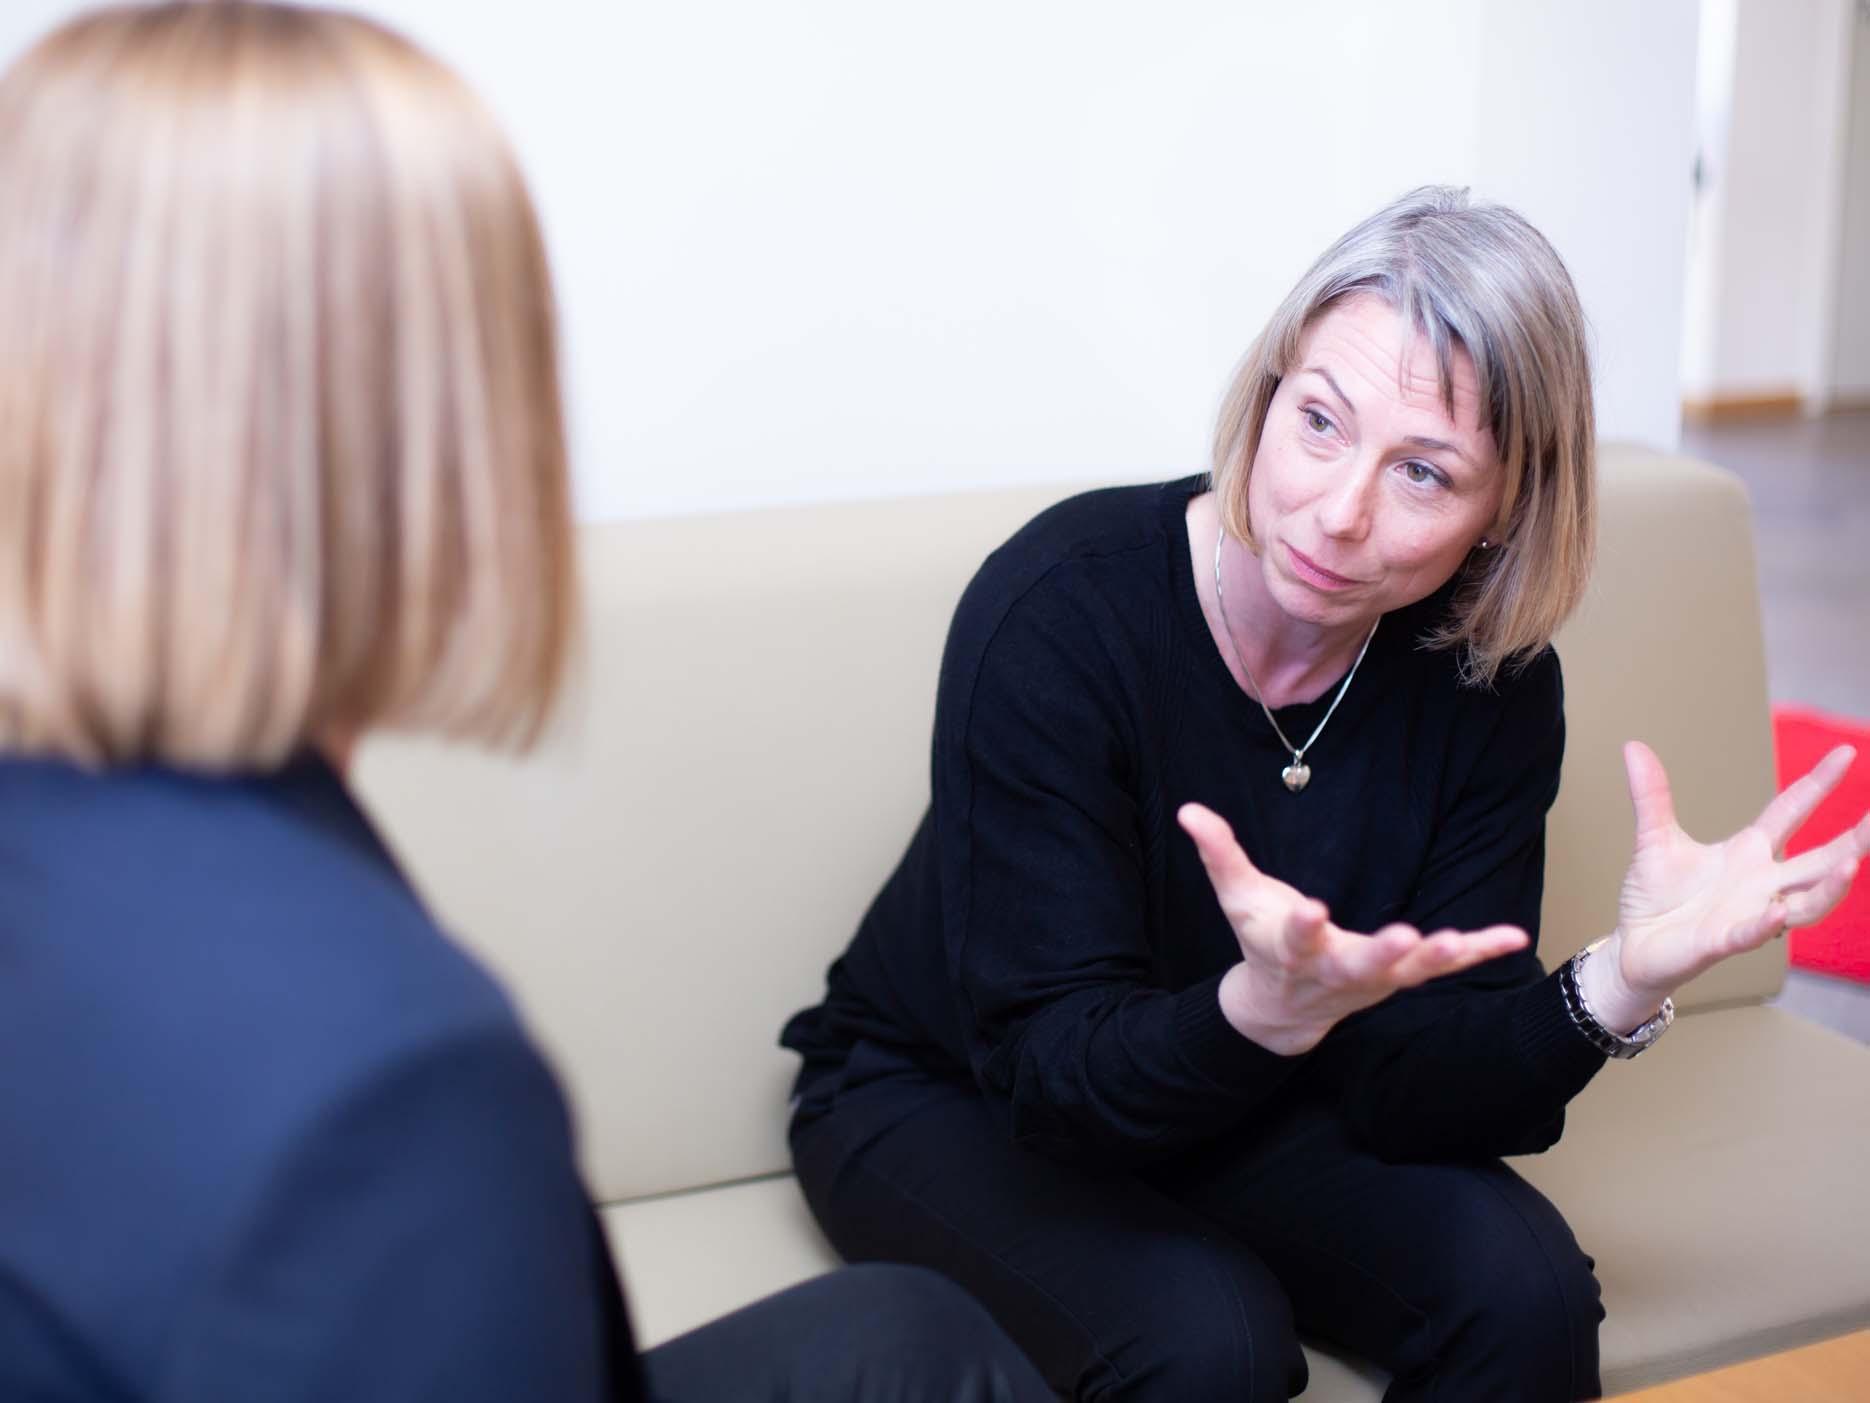 Bli en coachande ledare -  Kraft & Balans